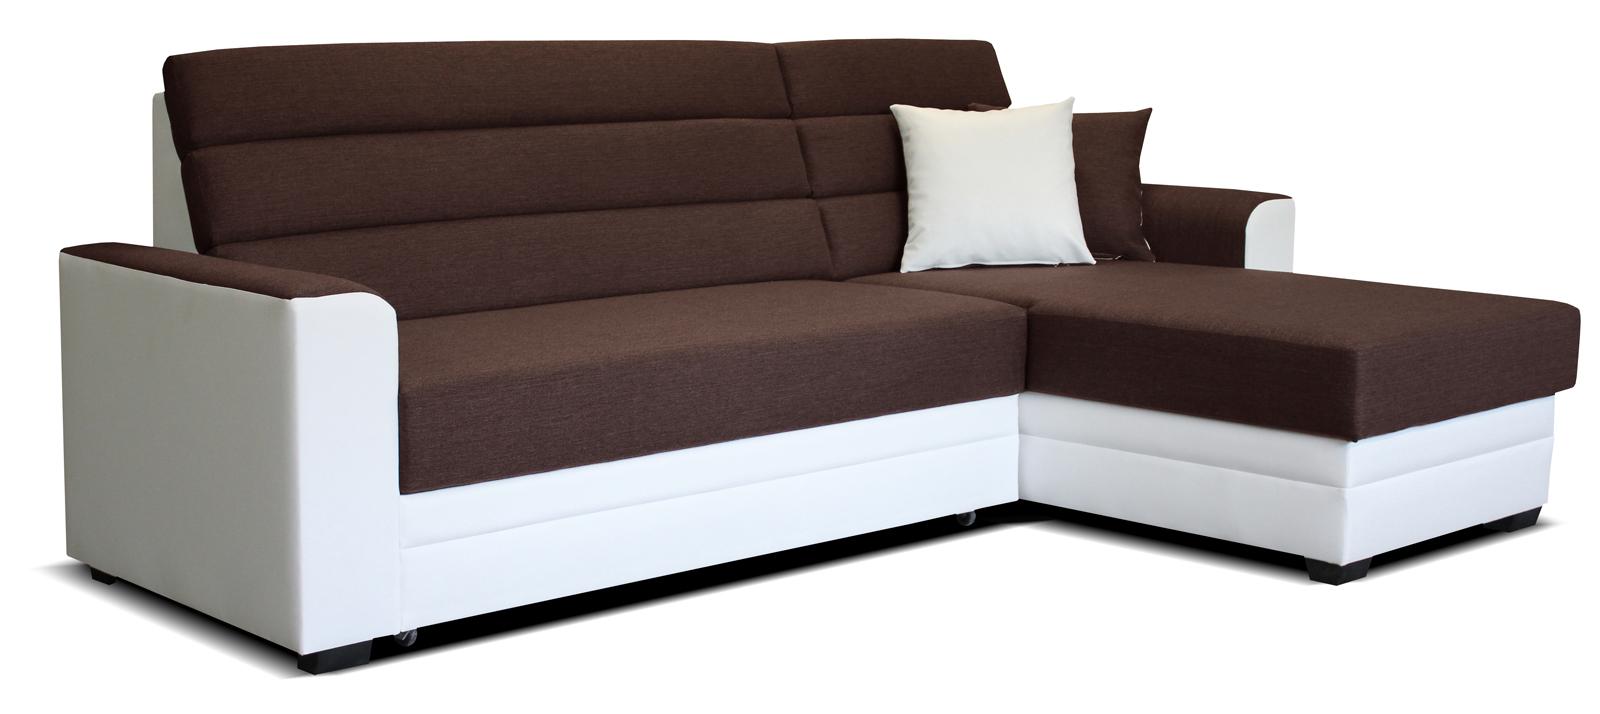 Rohová sedací souprava - Po-Sed - Ulm 2F+L (hnědá + bílá) (P)